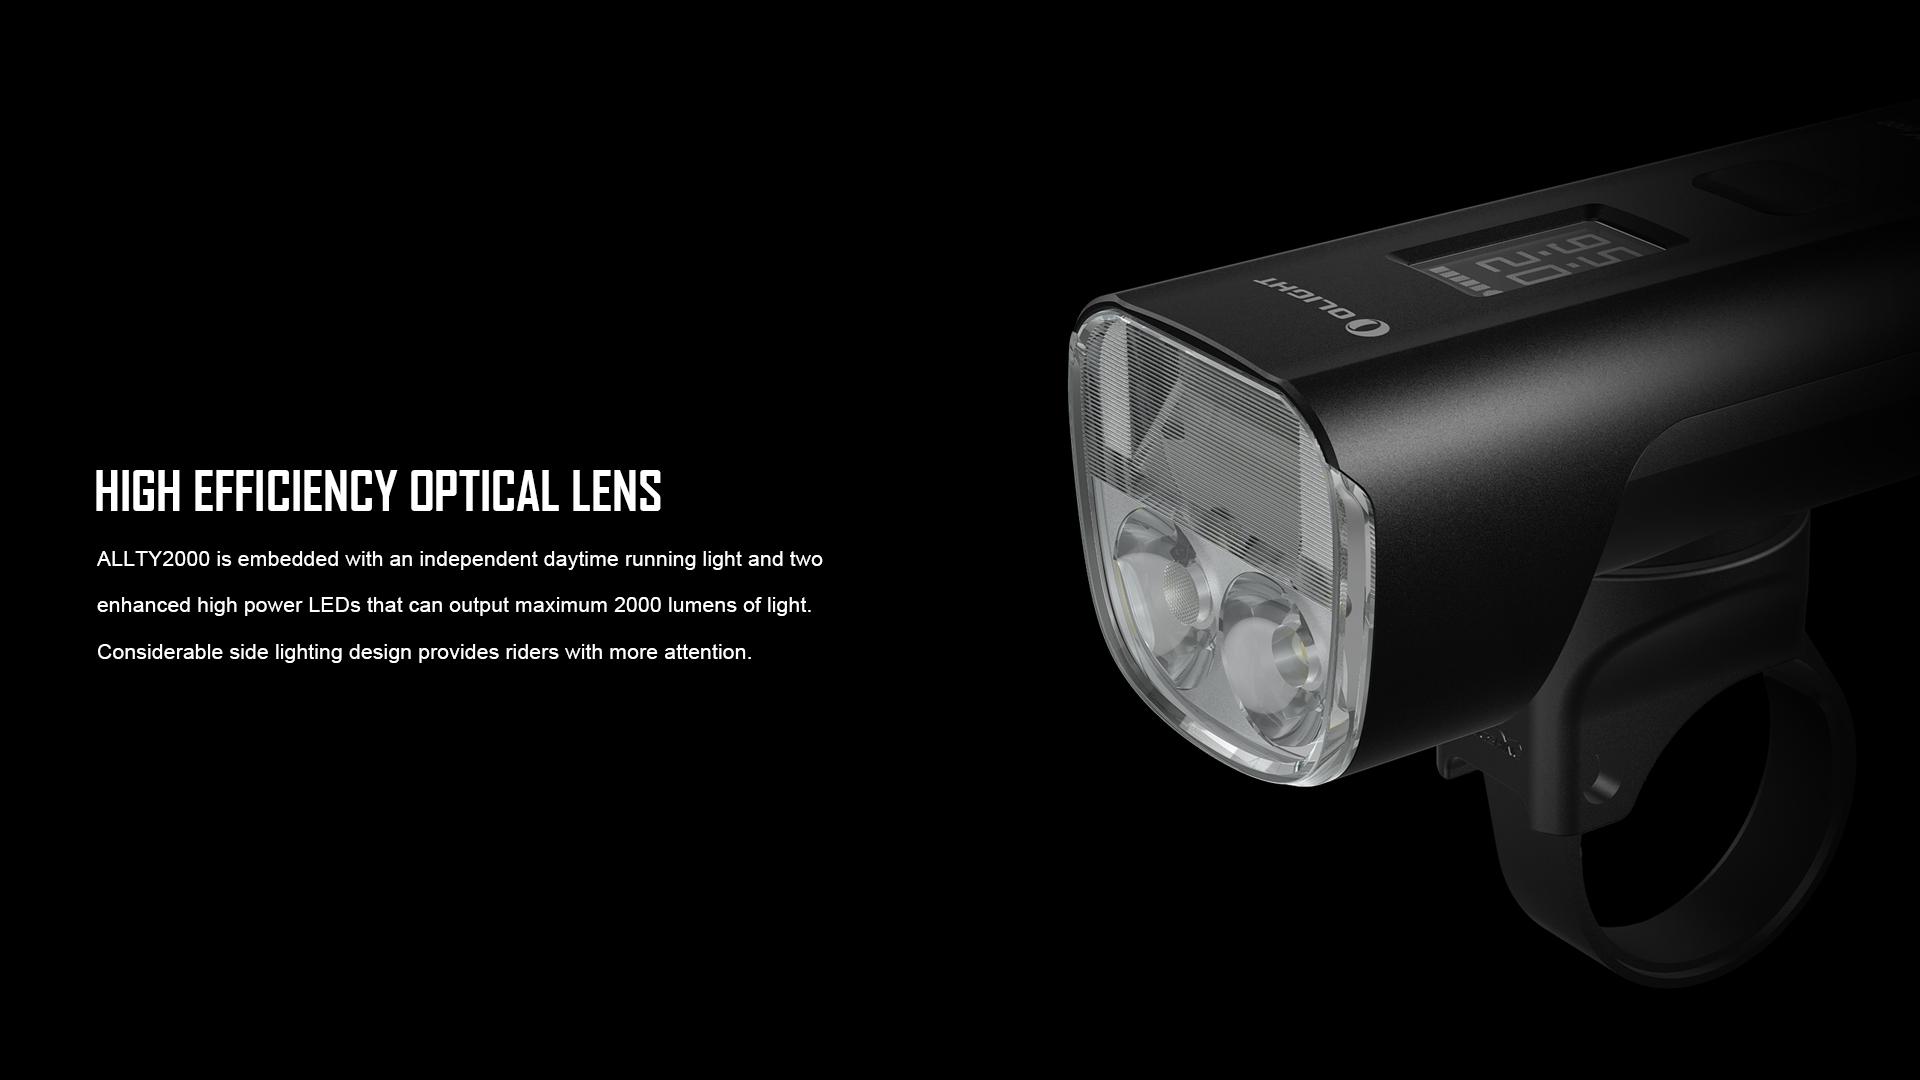 ALLTY 2000 has high-power LED